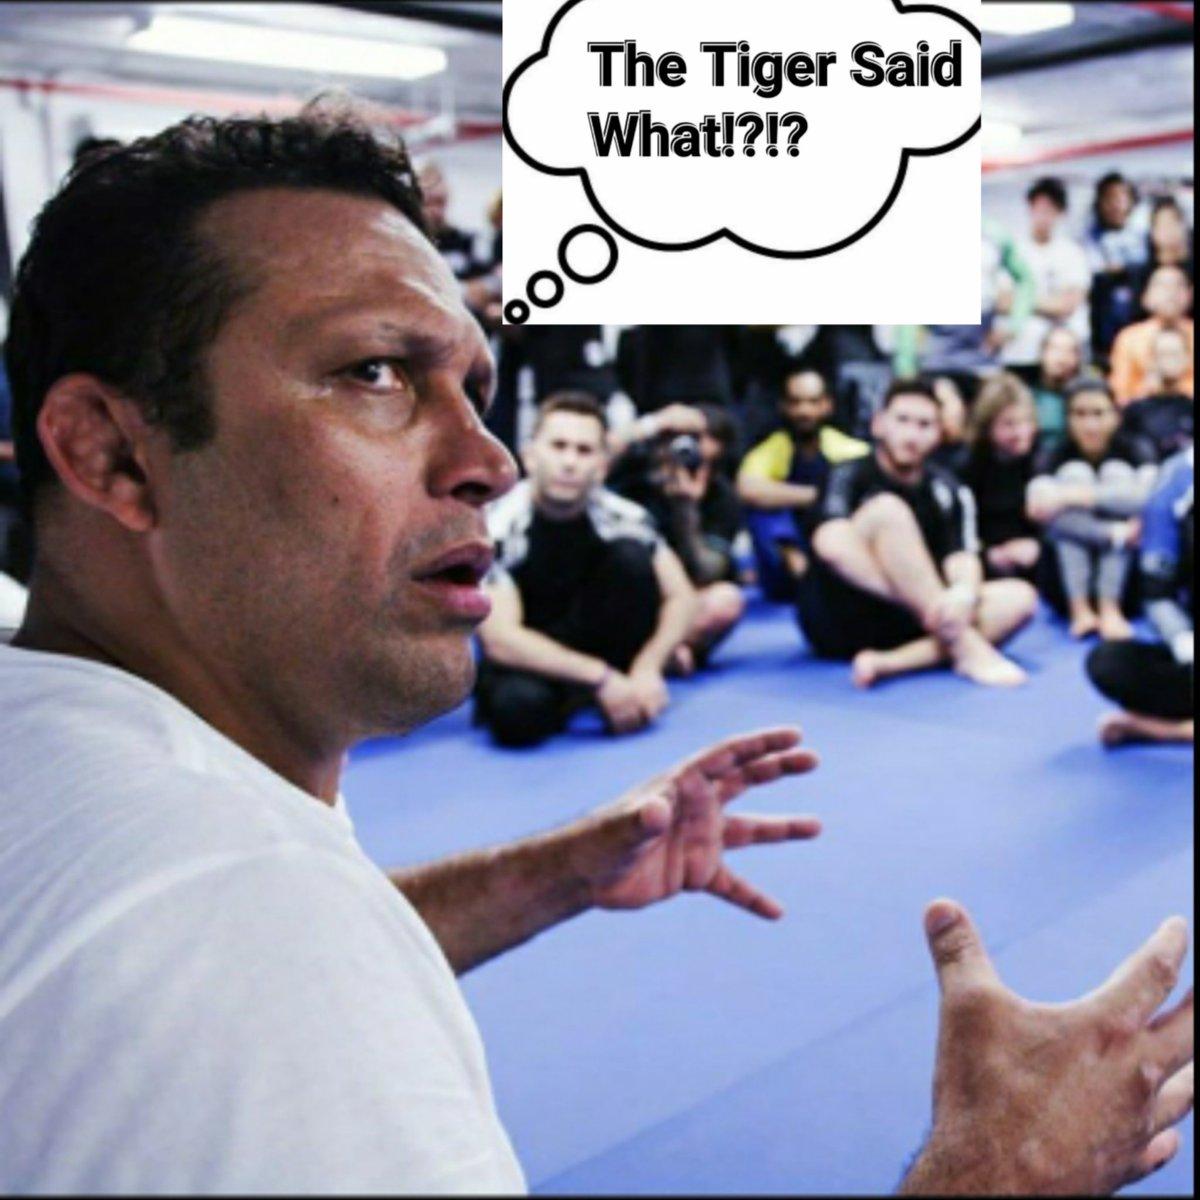 Maestro Renzo Gracie is like The Tiger said what!?!? #TeamRenzoGracie @RenzoGracieBJJ #AnthonyTheTigerCruz @Twitter https://t.co/1SPcryUfSI